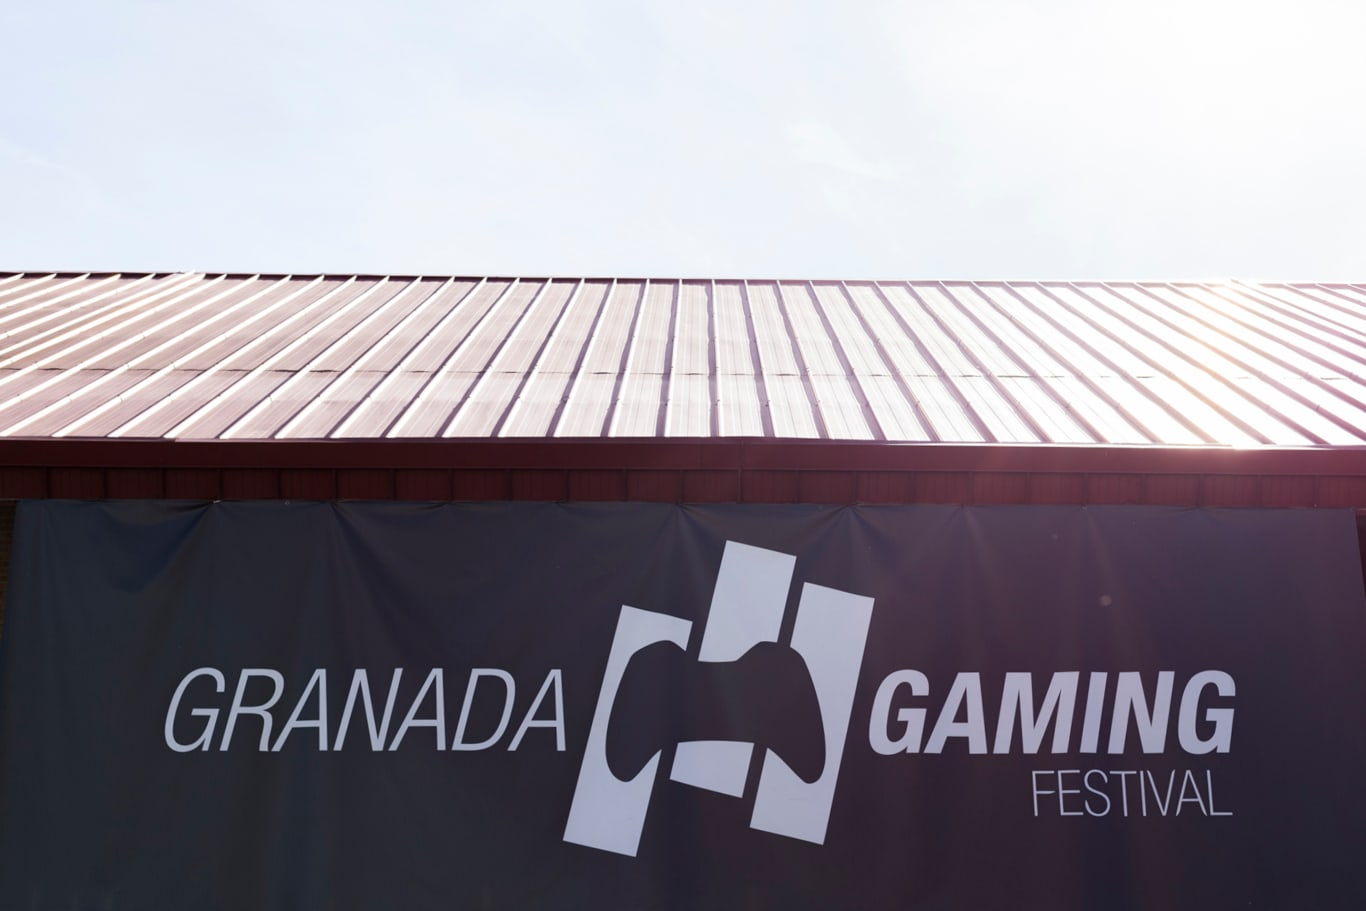 Granada Gaming Festival 2019